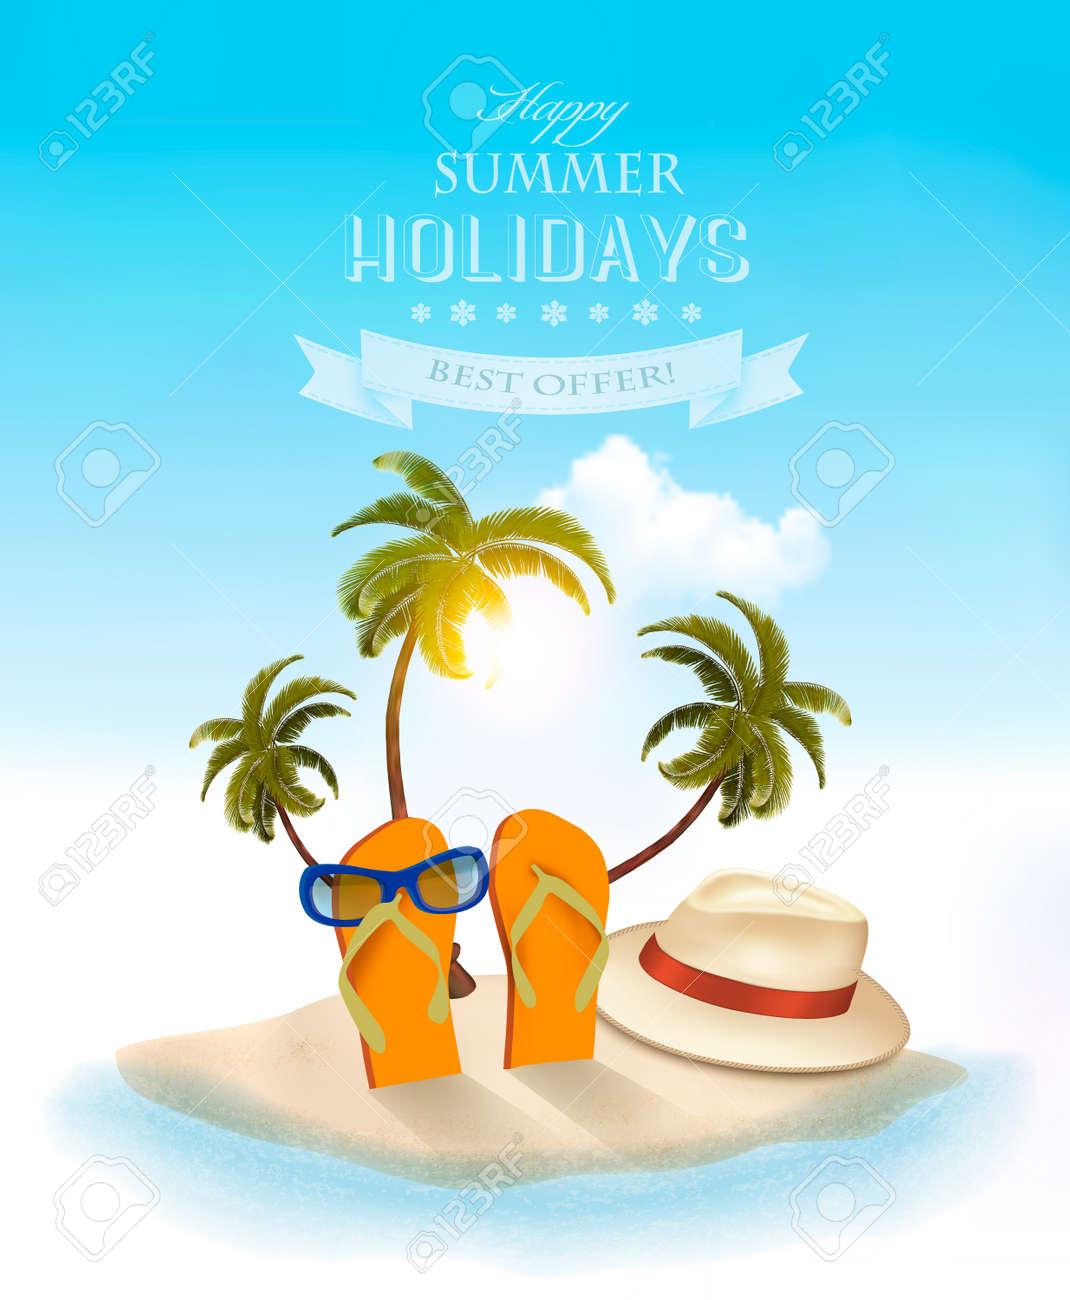 Summer holidays background. Vacation memories. Vector. - 78147729